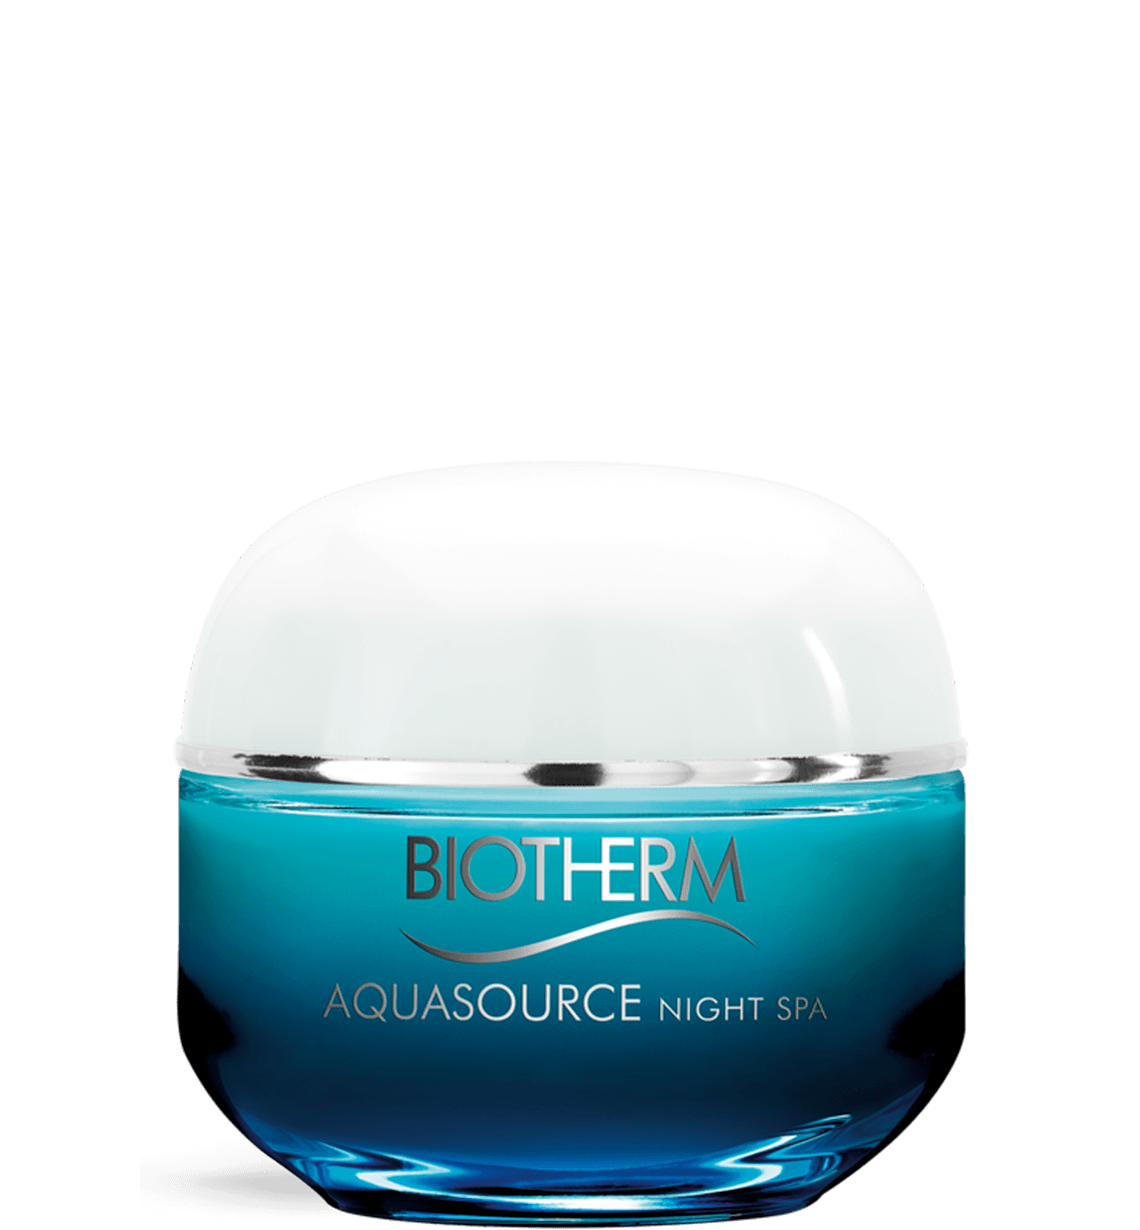 biotherm aquasource night